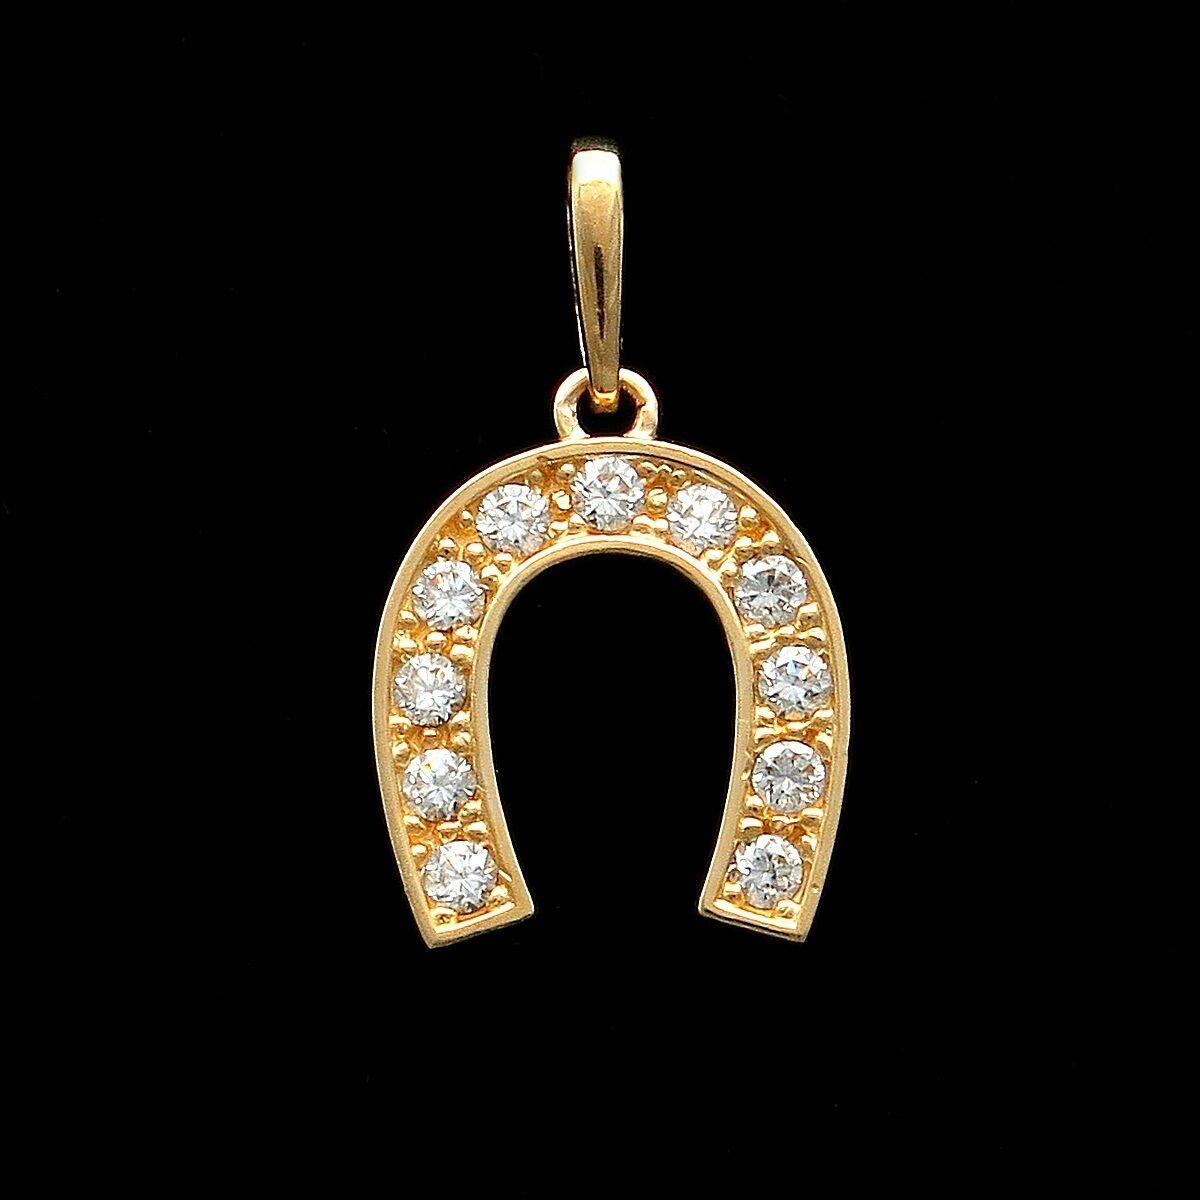 0.25Ct Round Cut Brilliant Horseshoe Pendant 14k Yellow gold Charm for Chain